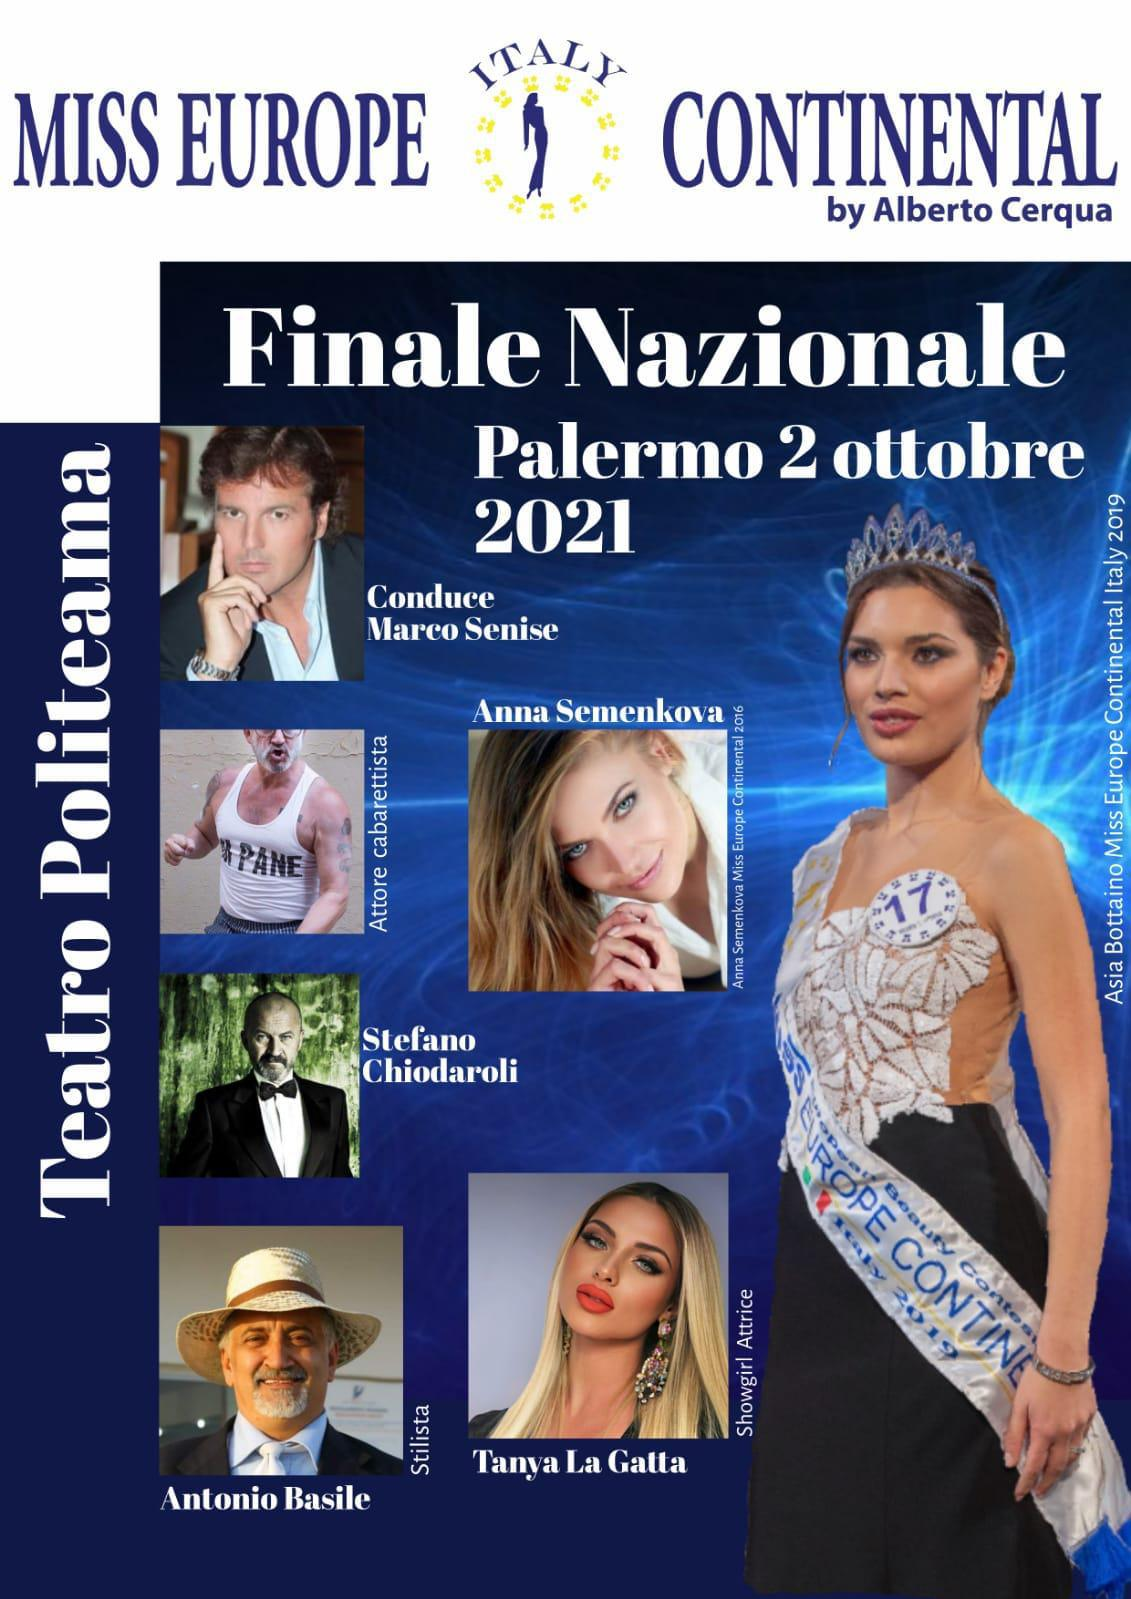 Miss Europe - Palermo